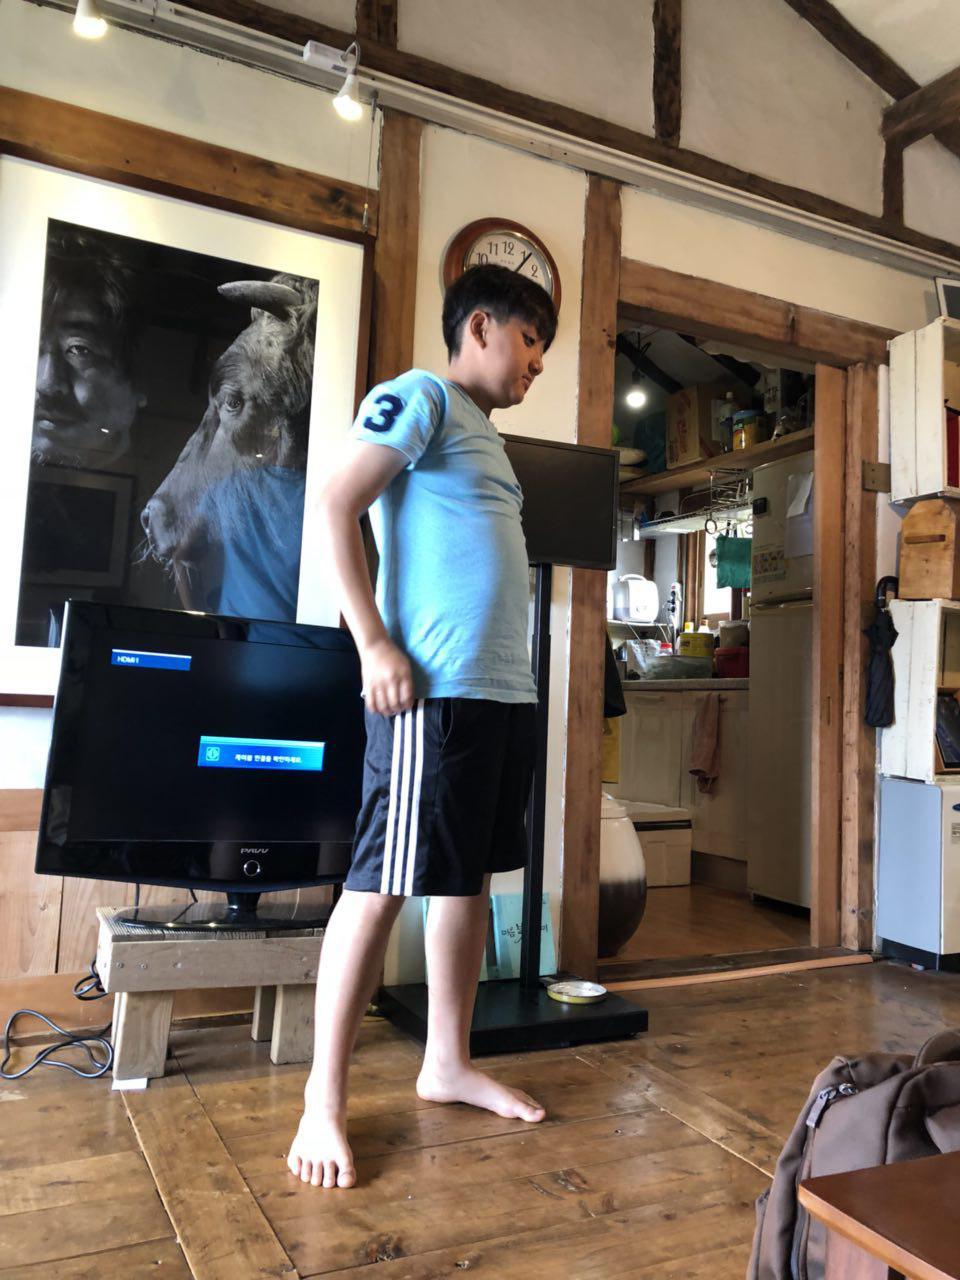 photo_2018-05-30_09-11-05.jpg